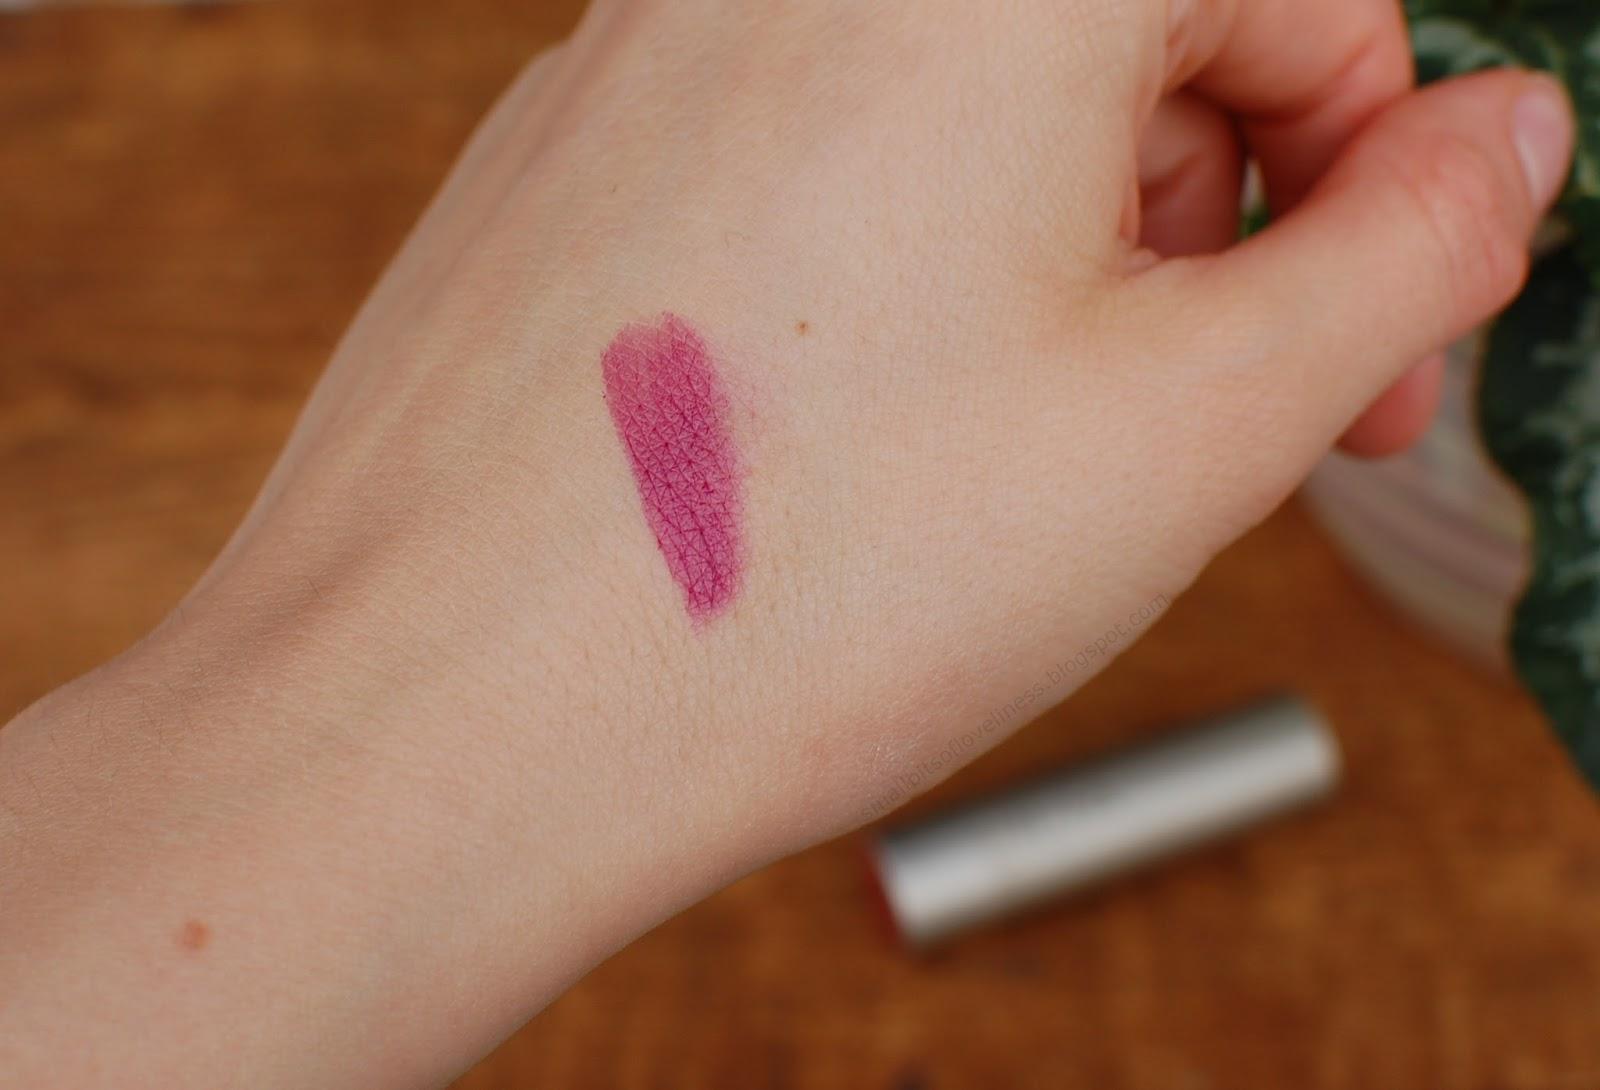 Ilia Beauty Ink Pot swatch